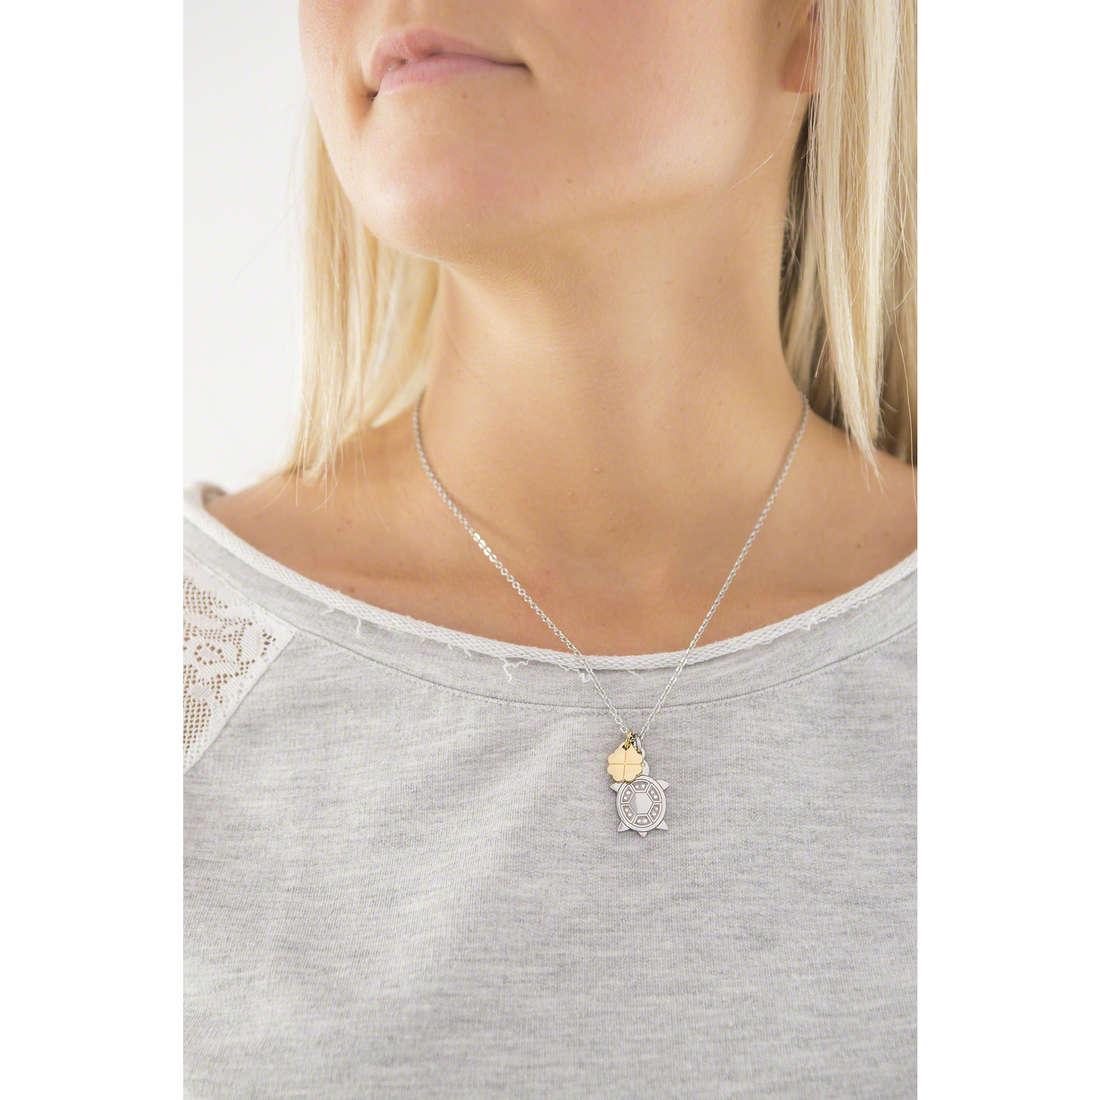 Sagapò necklaces Blinky woman SBK08 indosso